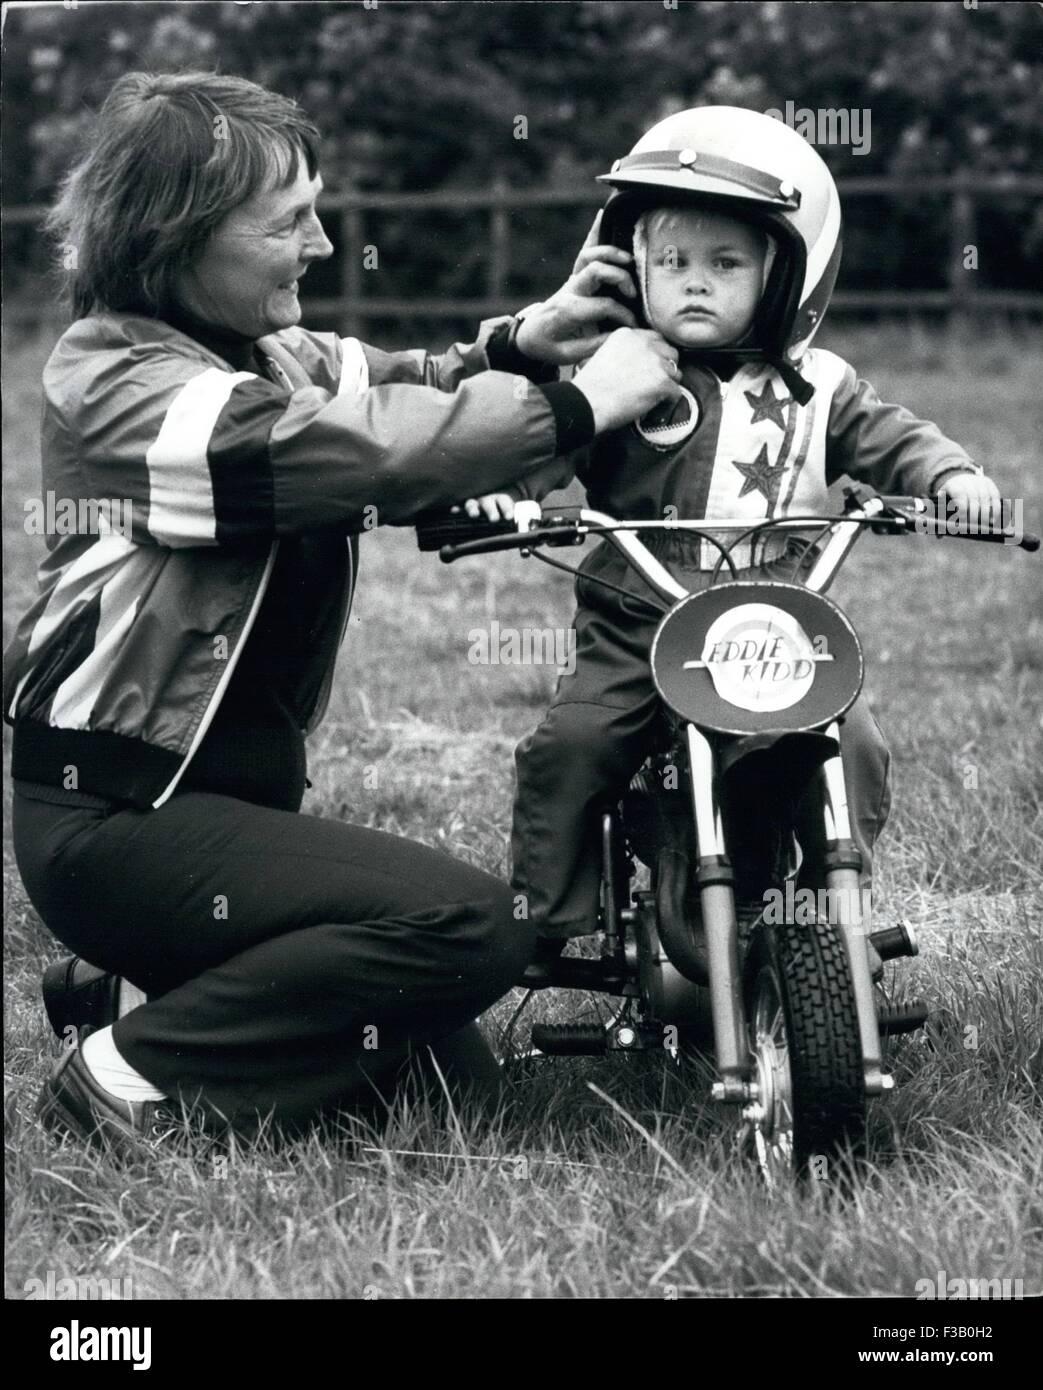 Dec. 19, 1981 - Bike stunts are kid s stuff at two Watch out Eddie ...